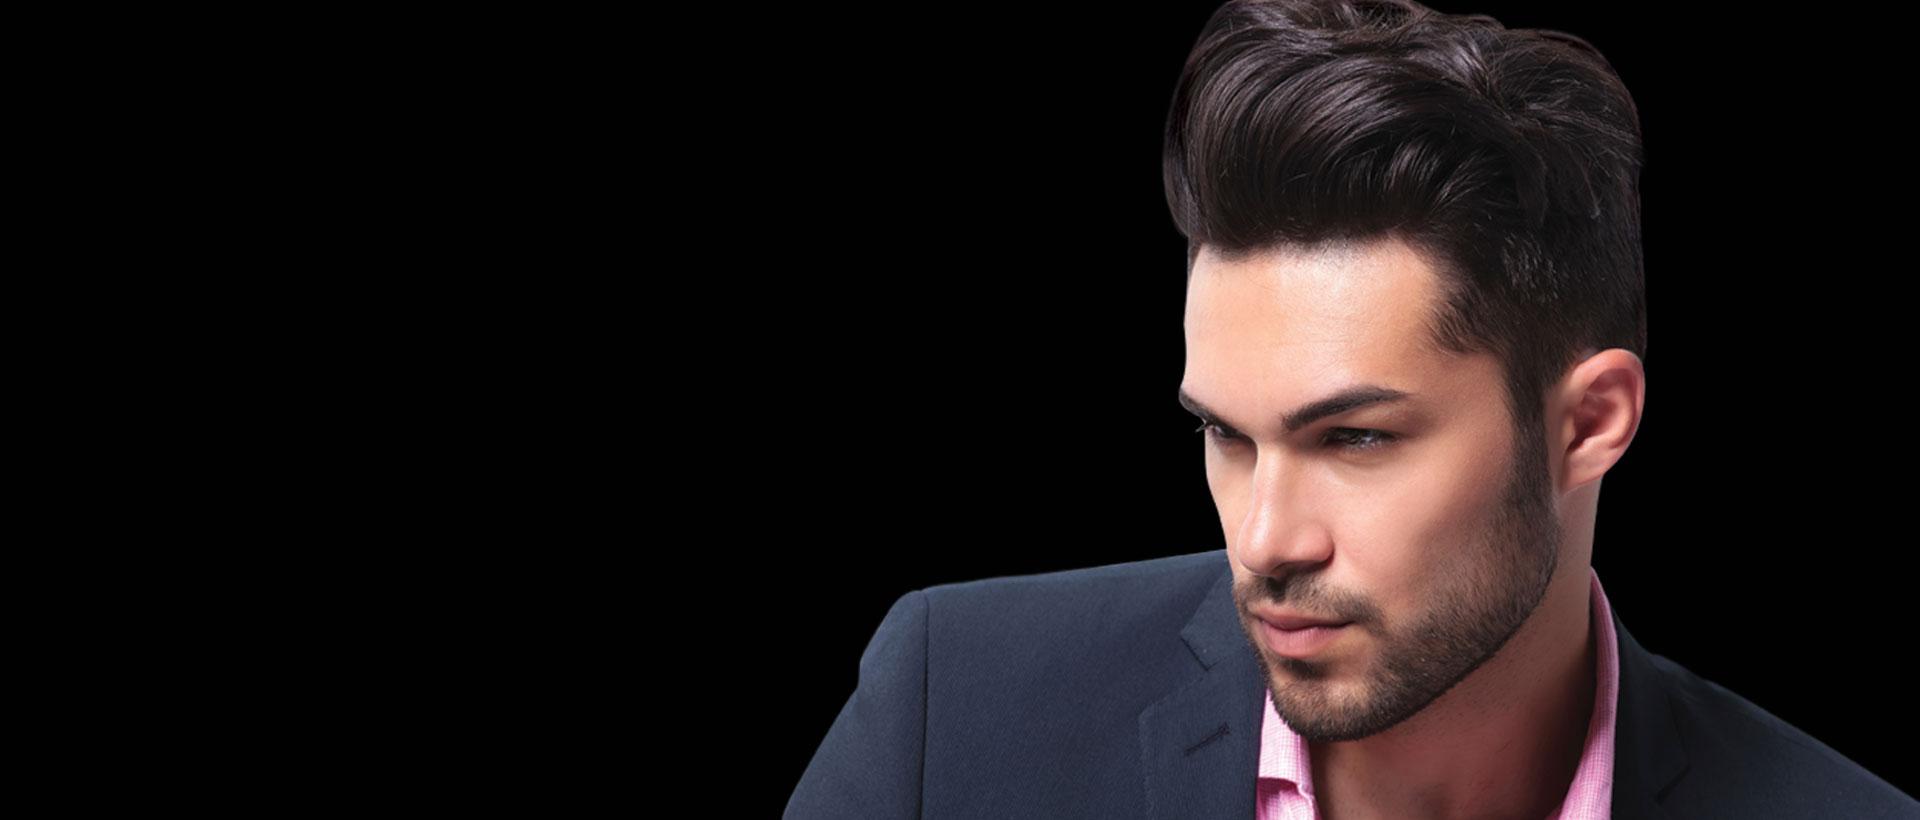 Coiffeur visagiste talence nanadianadera blog - Salon de coiffure qui recherche apprenti ...